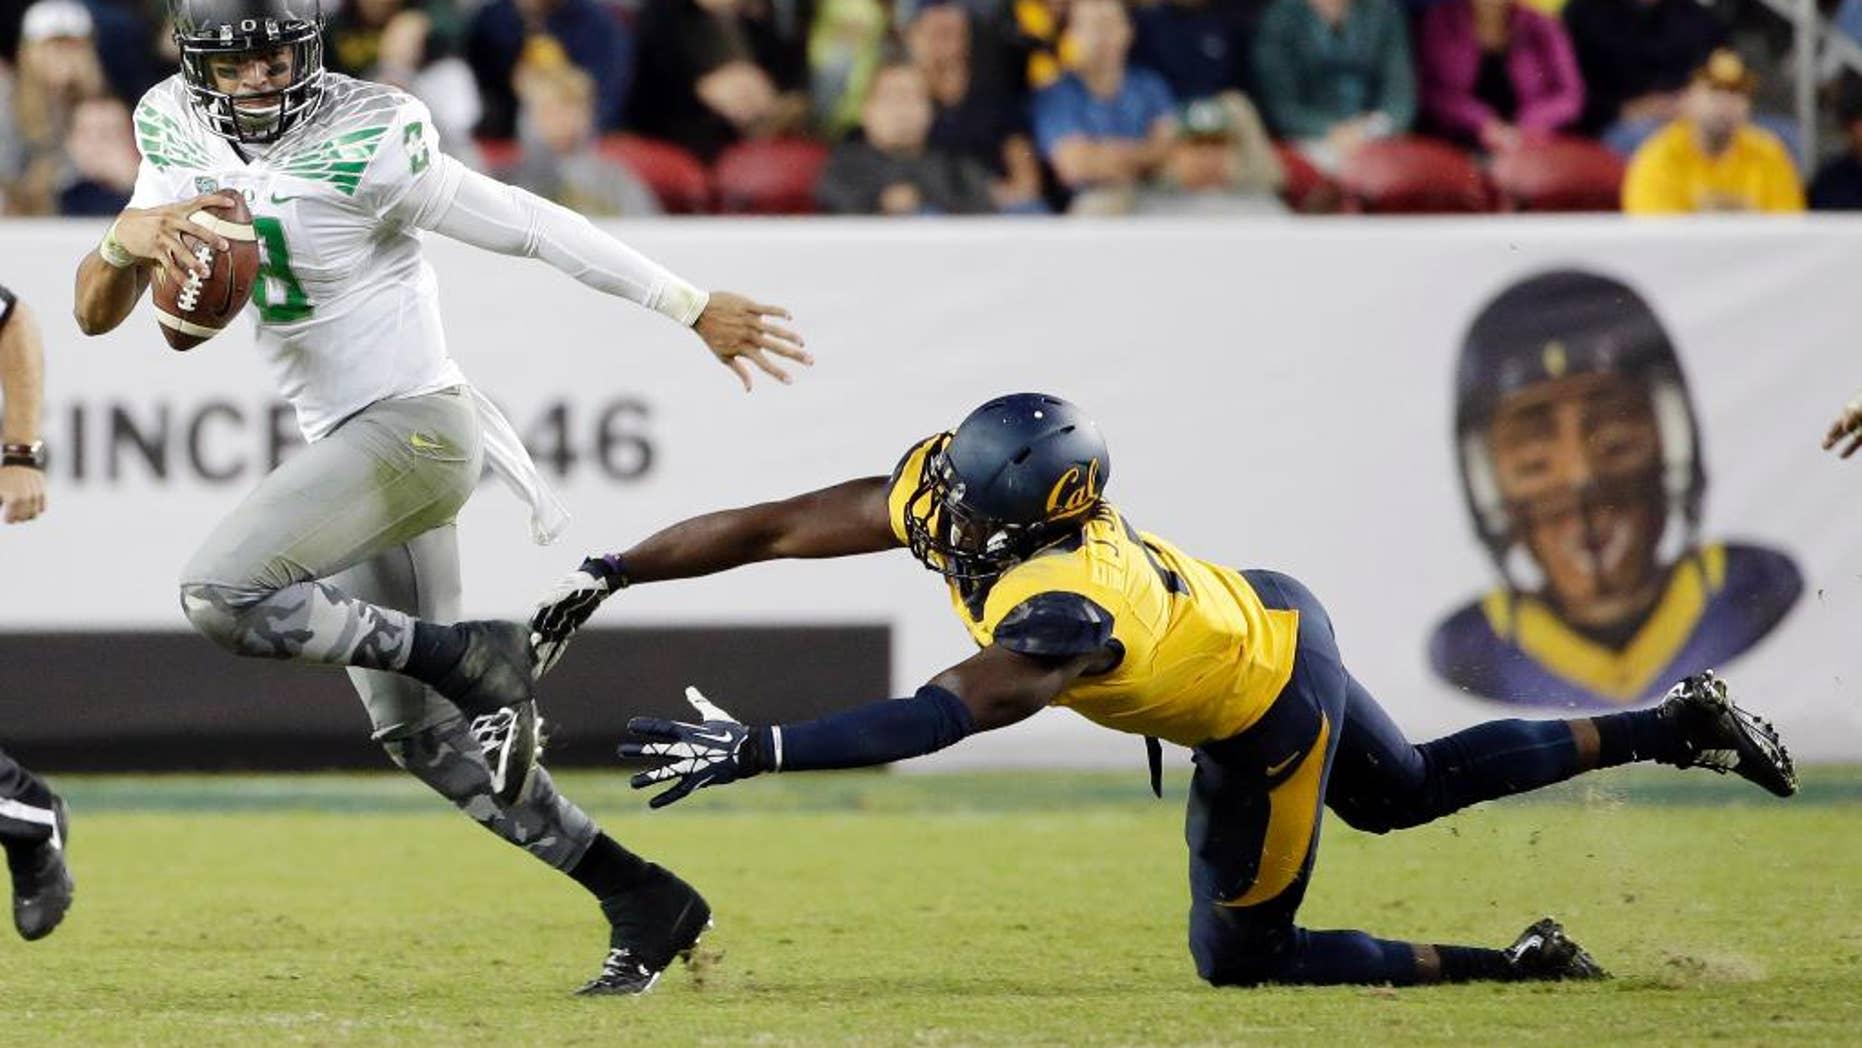 Oregon quarterback Marcus Mariota runs past California defensive end Jonathan Johnson during the second half of an NCAA college football game Friday, Oct. 24, 2014, in Santa Clara, Calif. (AP Photo/Marcio Jose Sanchez)